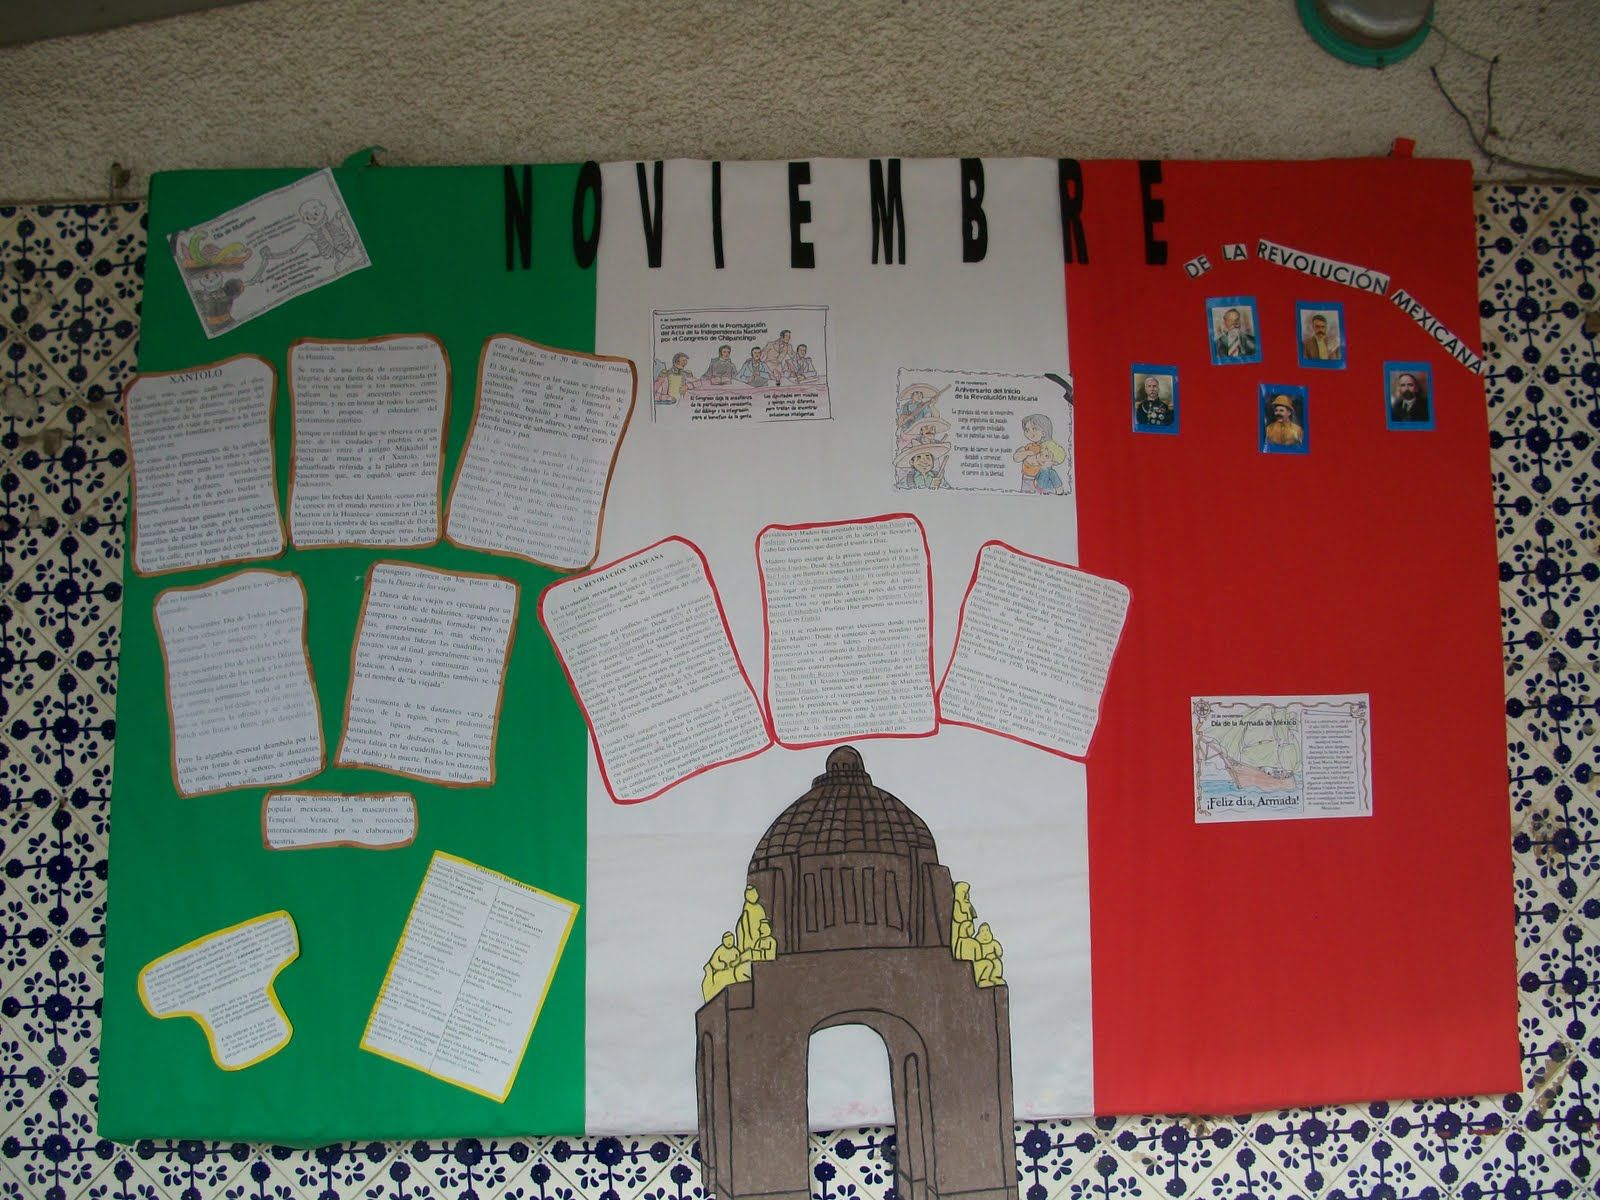 Supervisi n escolar zona 002 tantoyuca norte el peri dico for Contenido del periodico mural